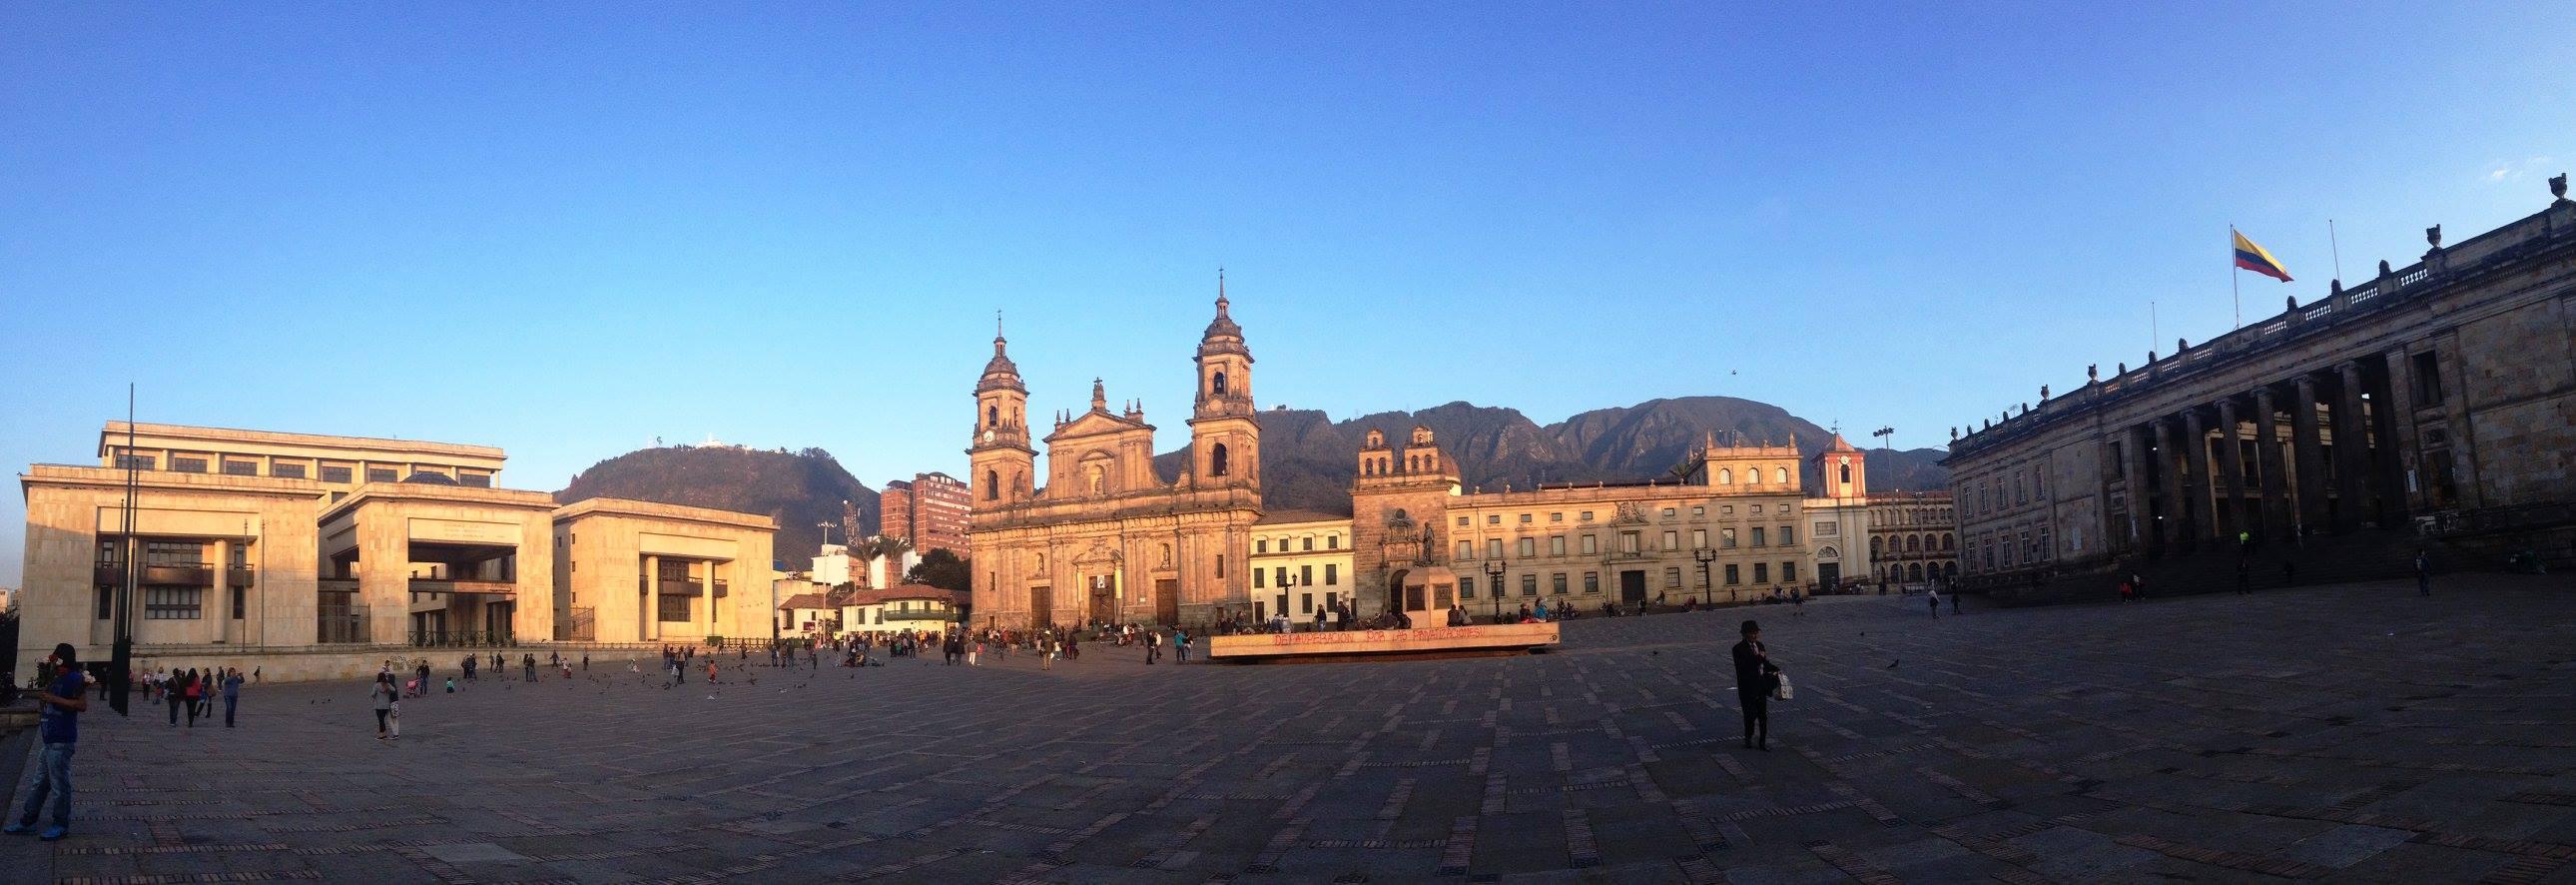 plaza bolivar colombie bogota